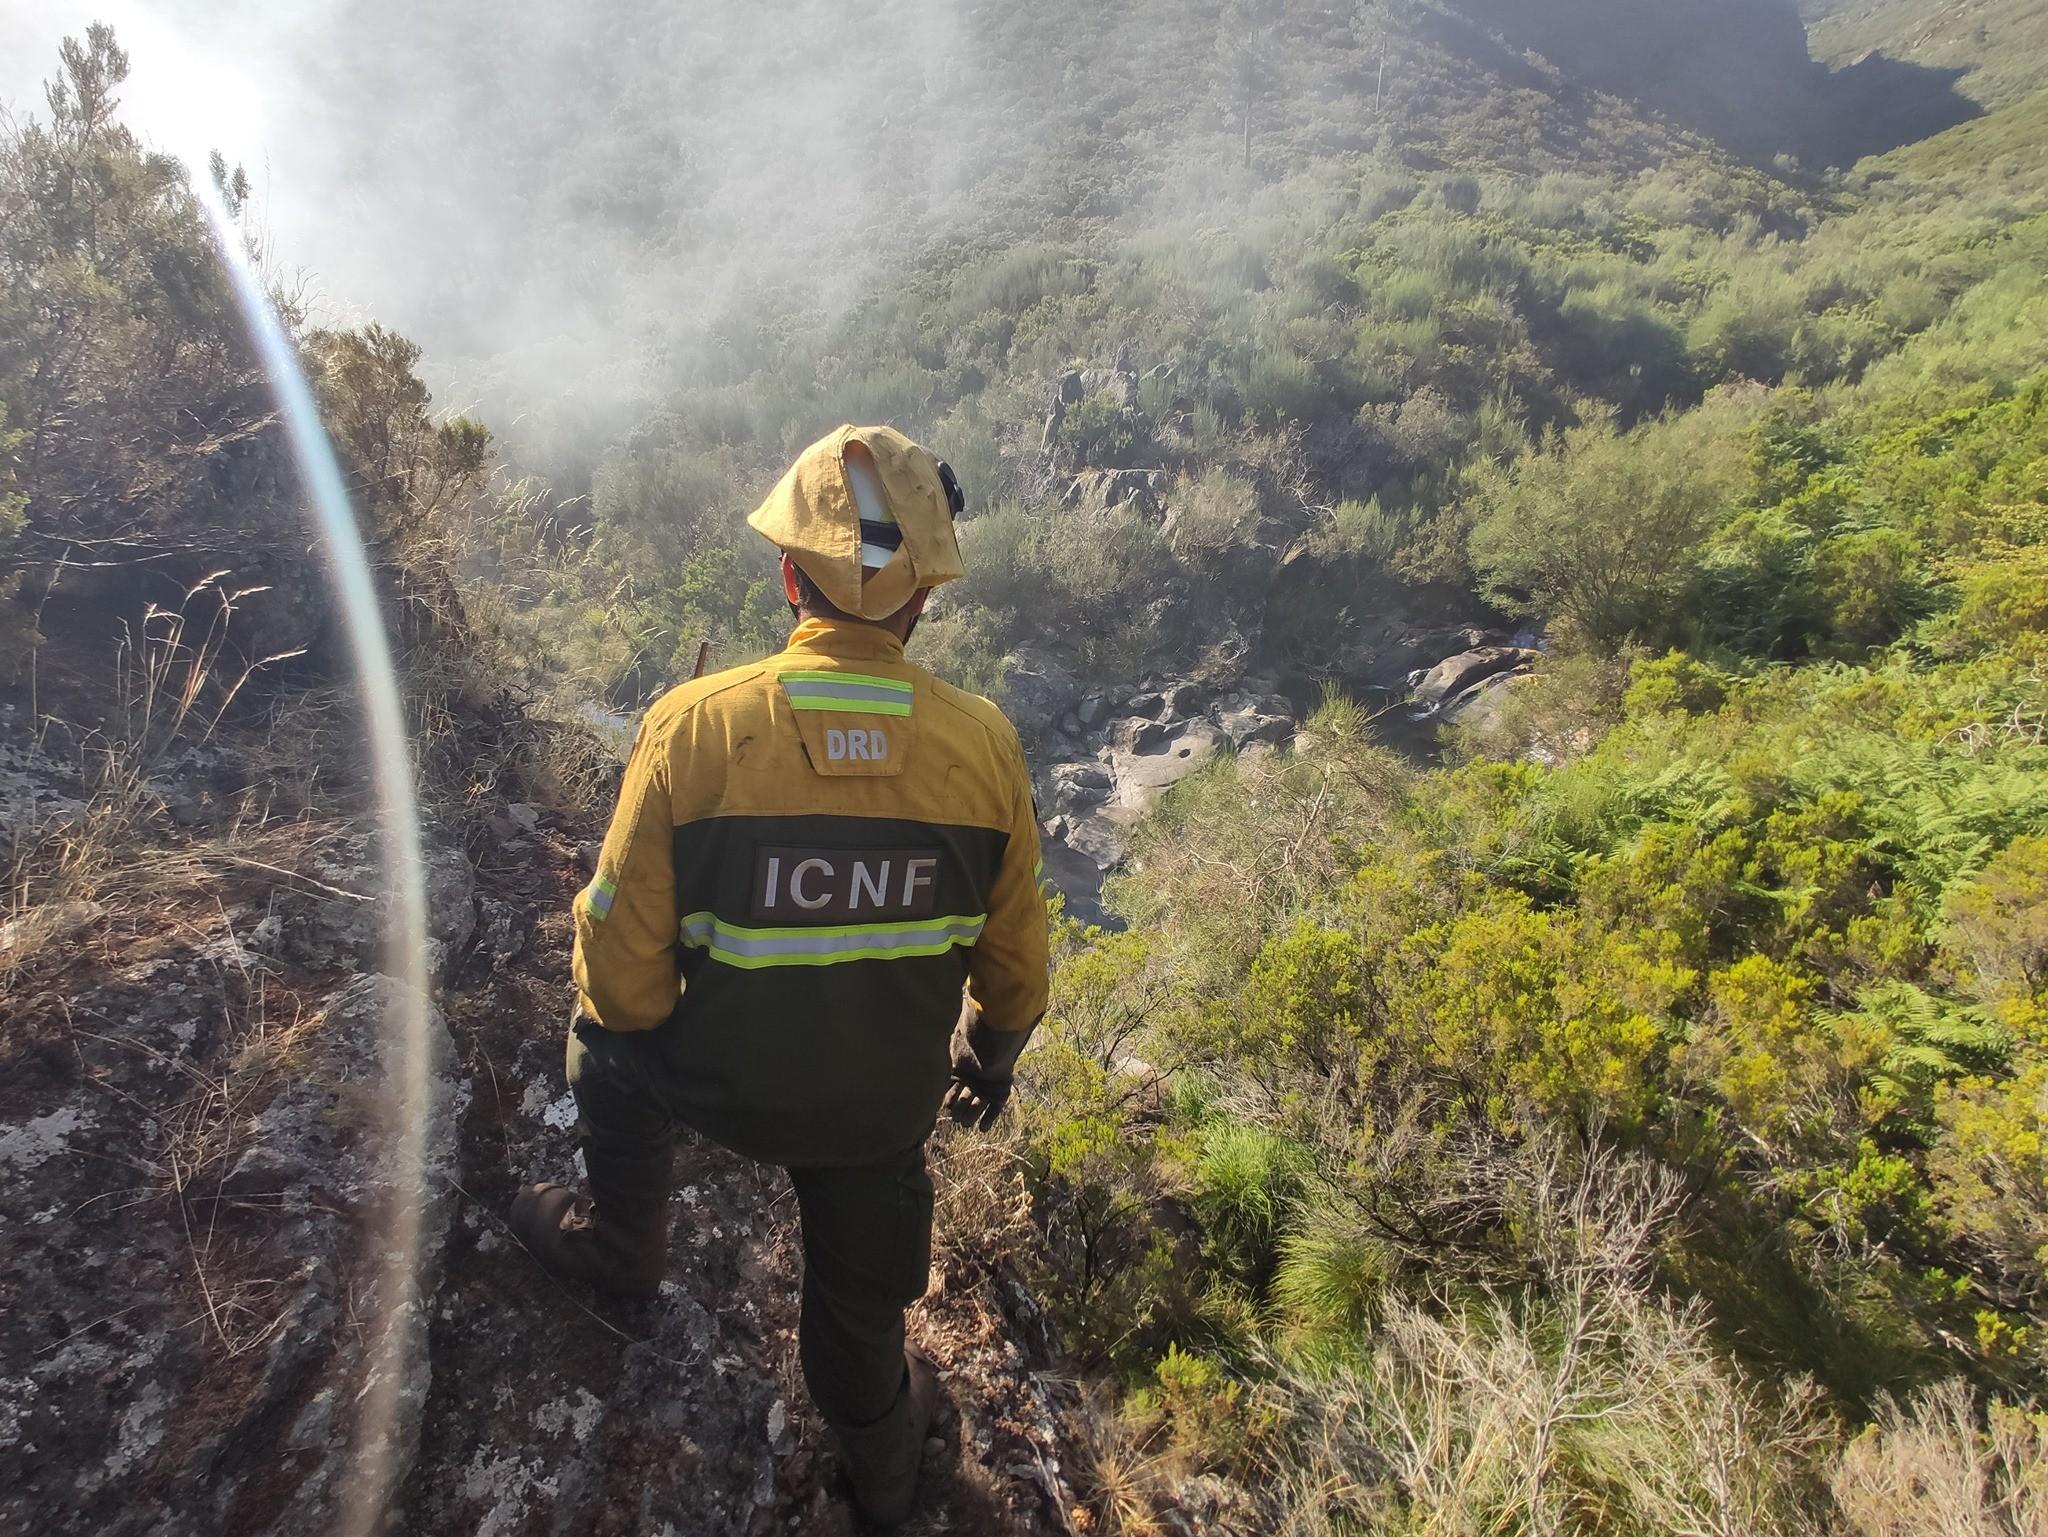 Portugal teve o menor número de incêndios desde 2011